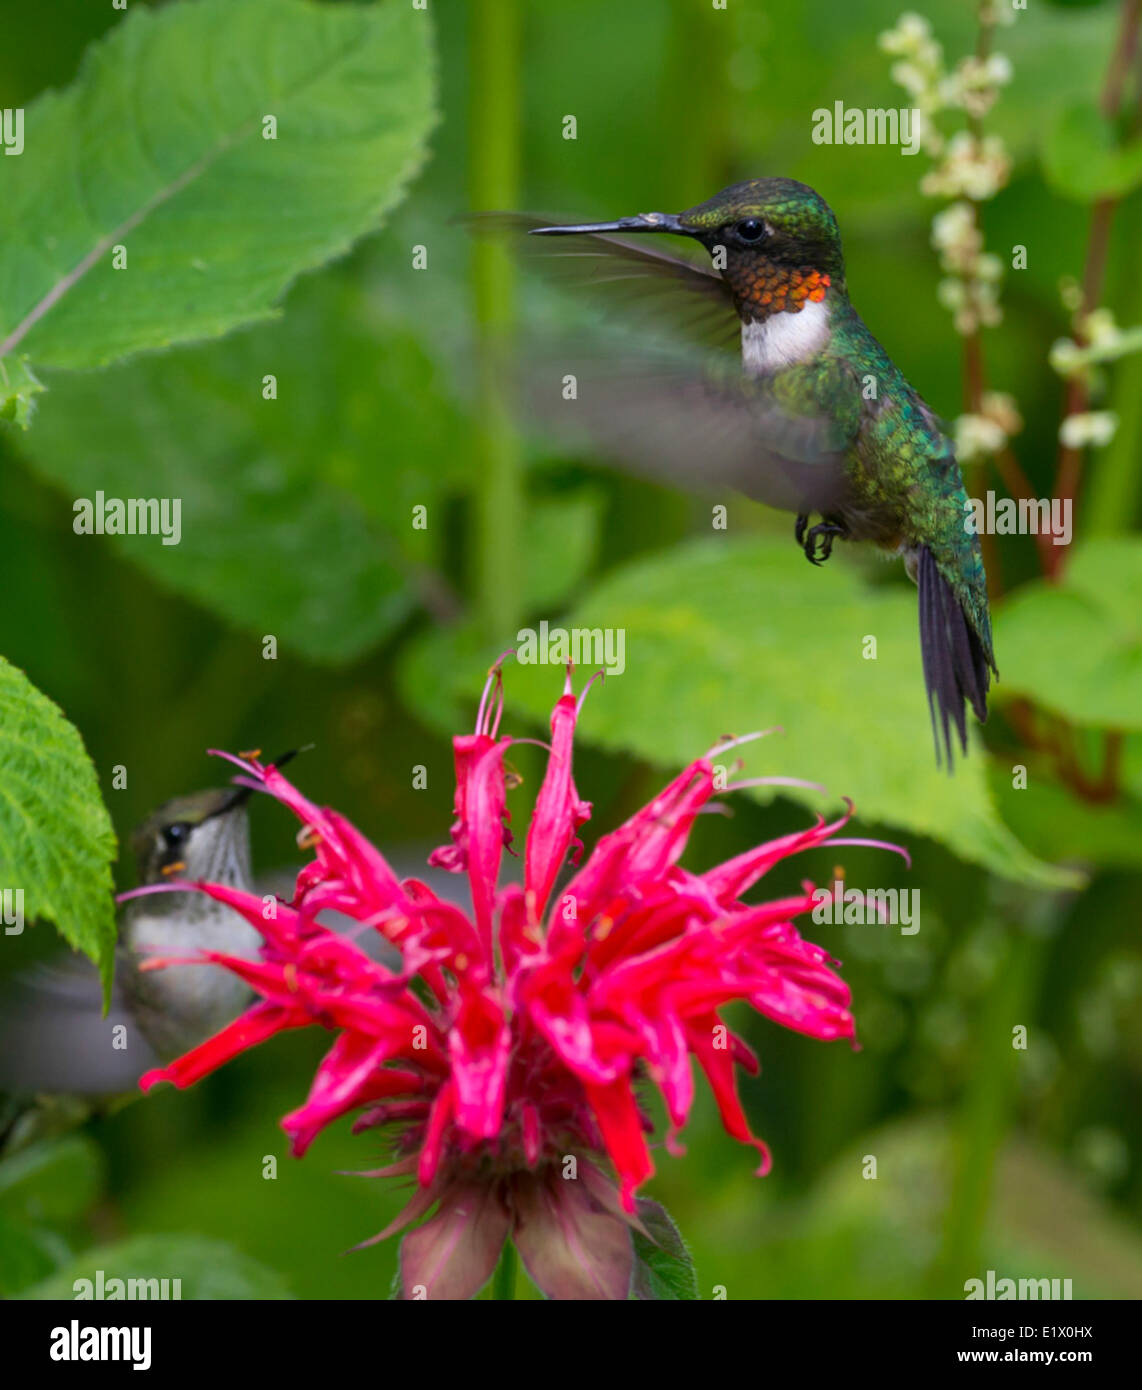 The Ruby-throated Hummingbird (Archilochus colubris) Stock Photo